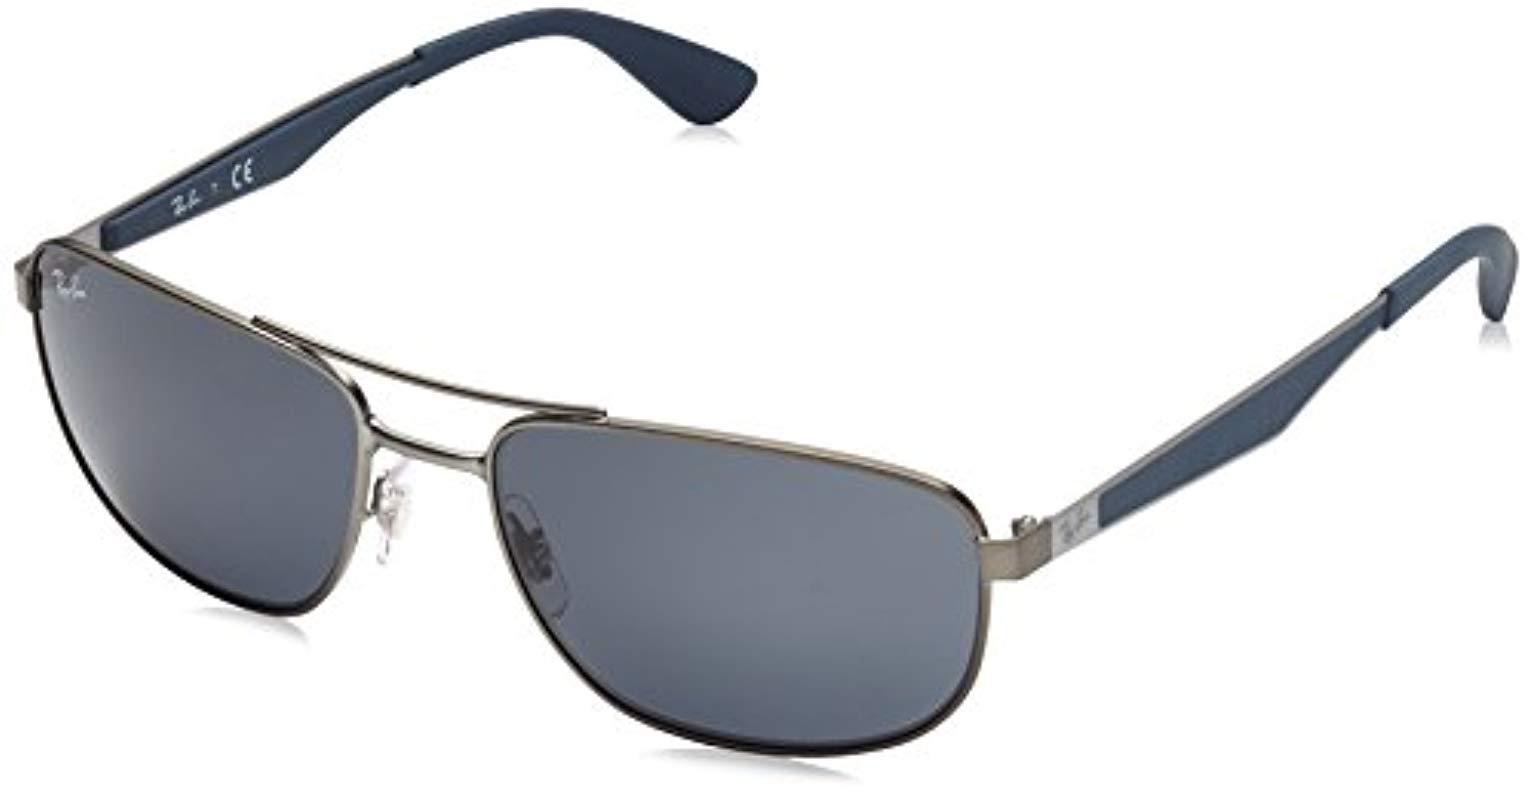 8a1e9f2d13 Ray-Ban. Men s Metal Sunglasses In Matte Black Polarised Rb3528 006 82 61